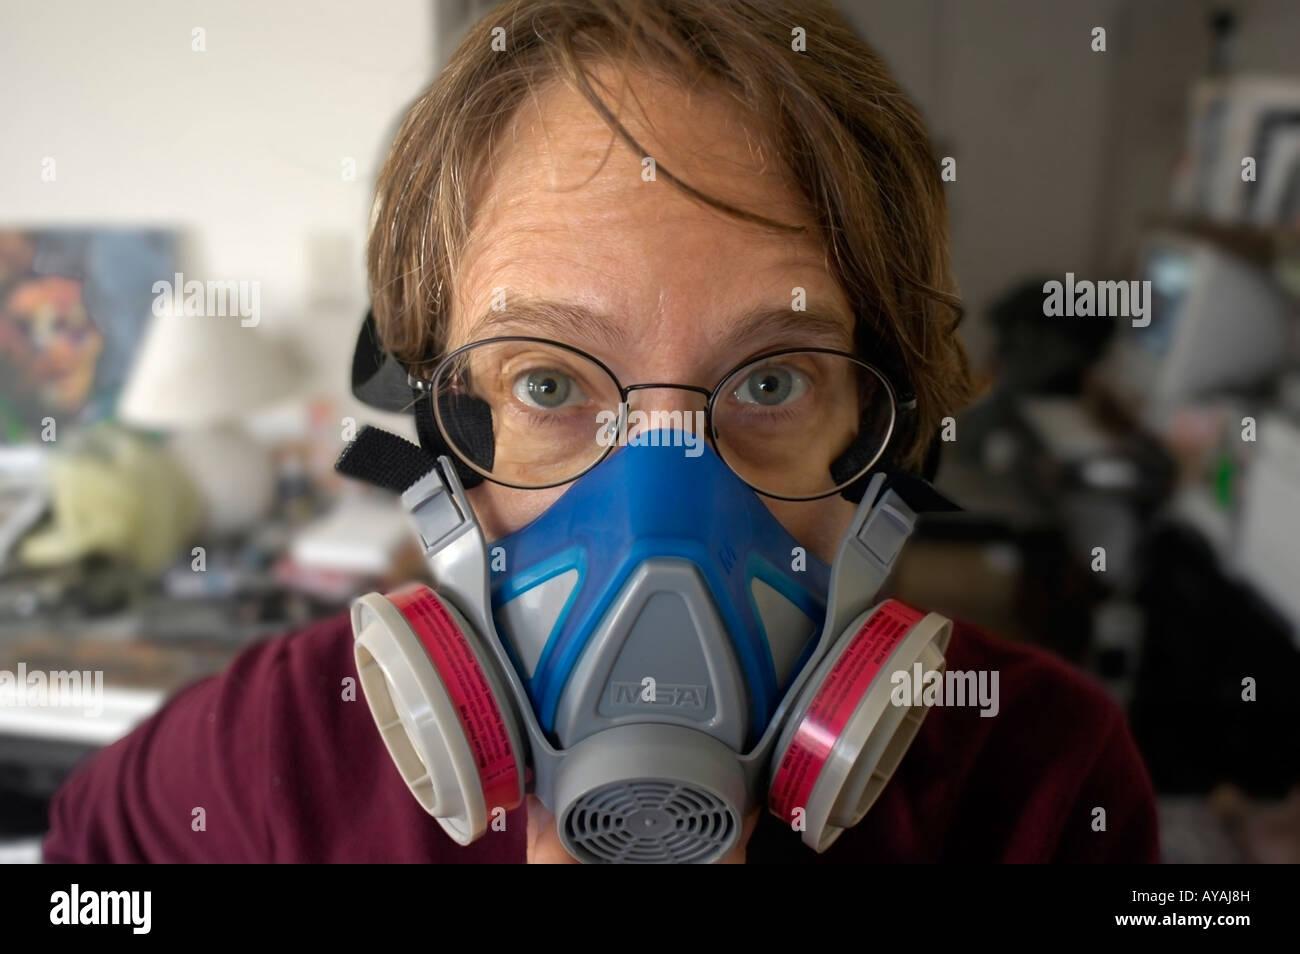 Stock Alamy Artist Photo Wears Woman Respirator - 17047168